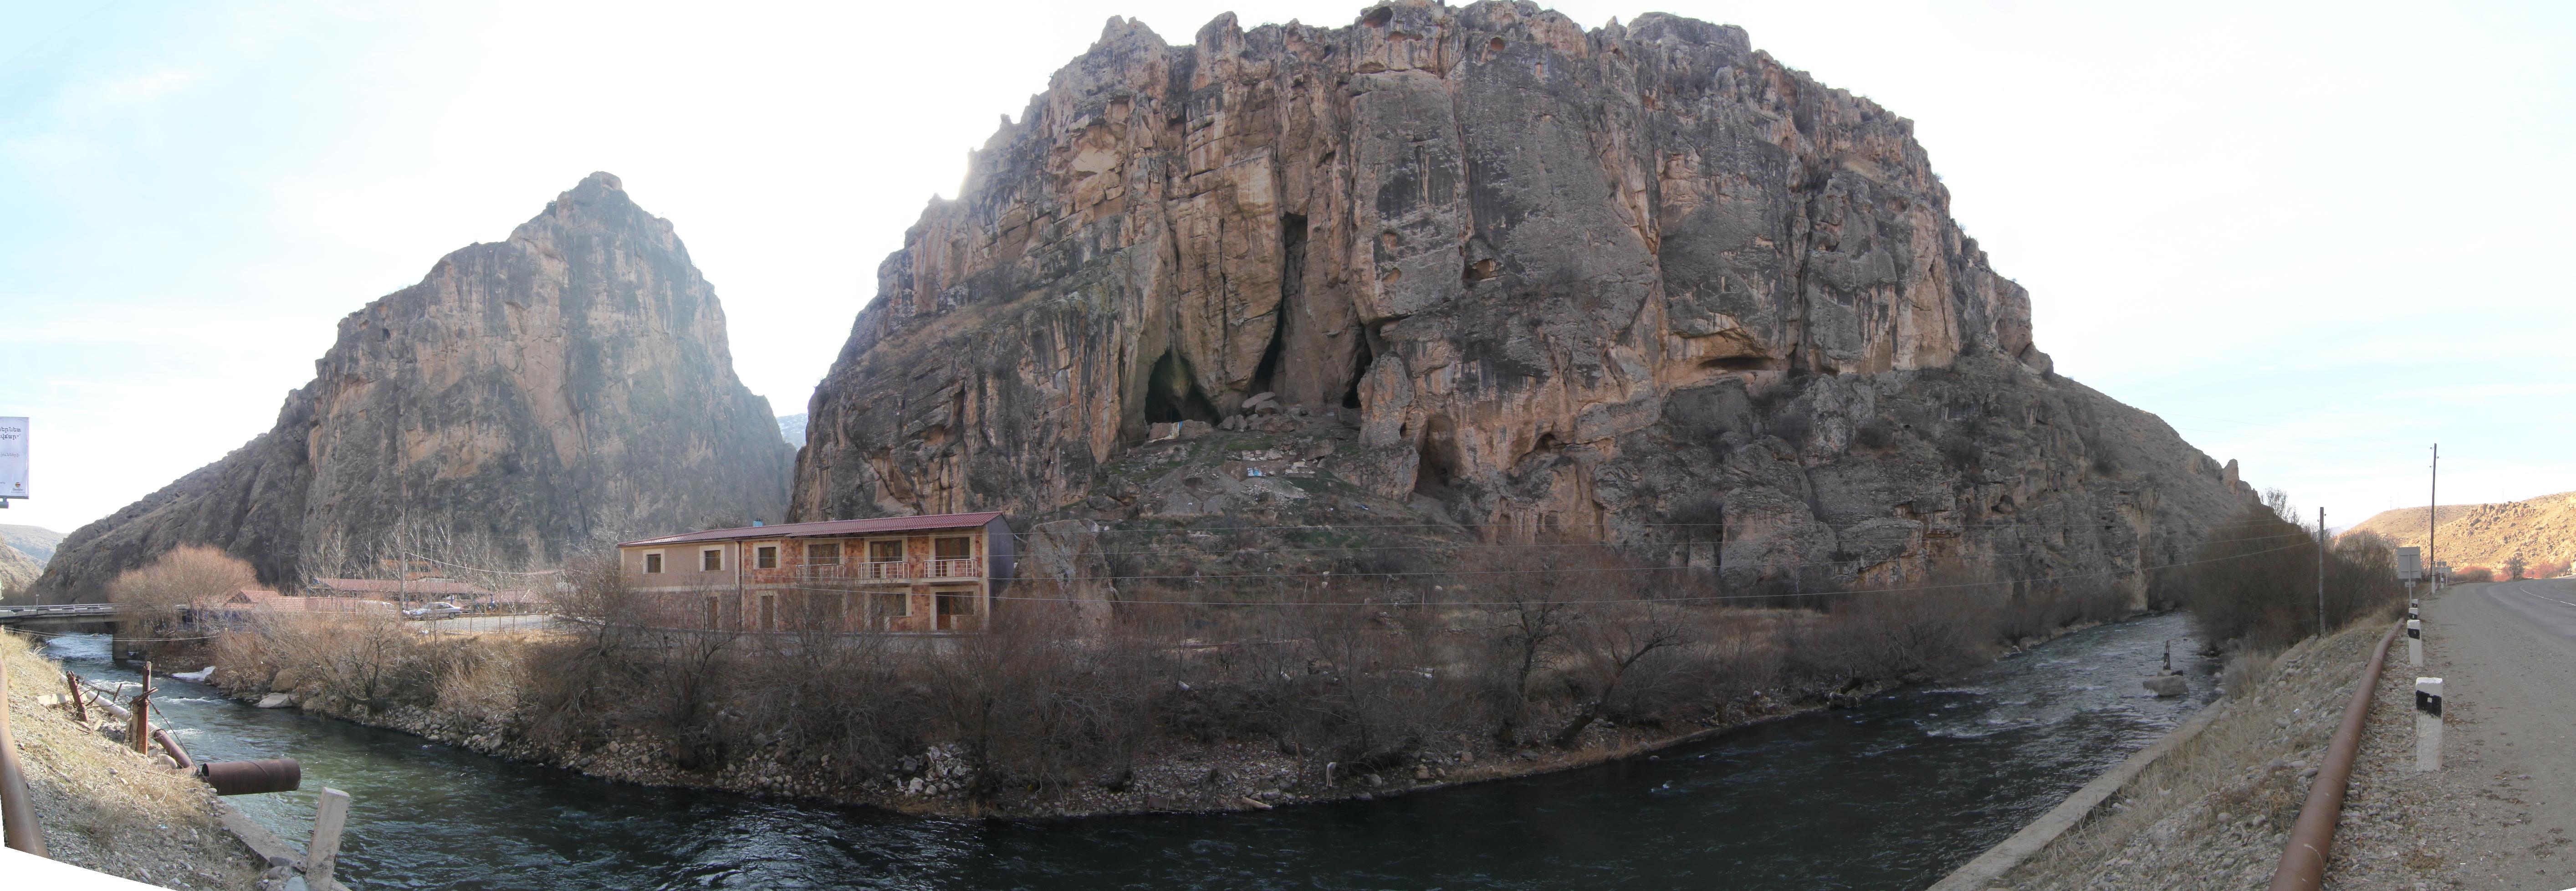 Areni-1 cave panorama.jpg